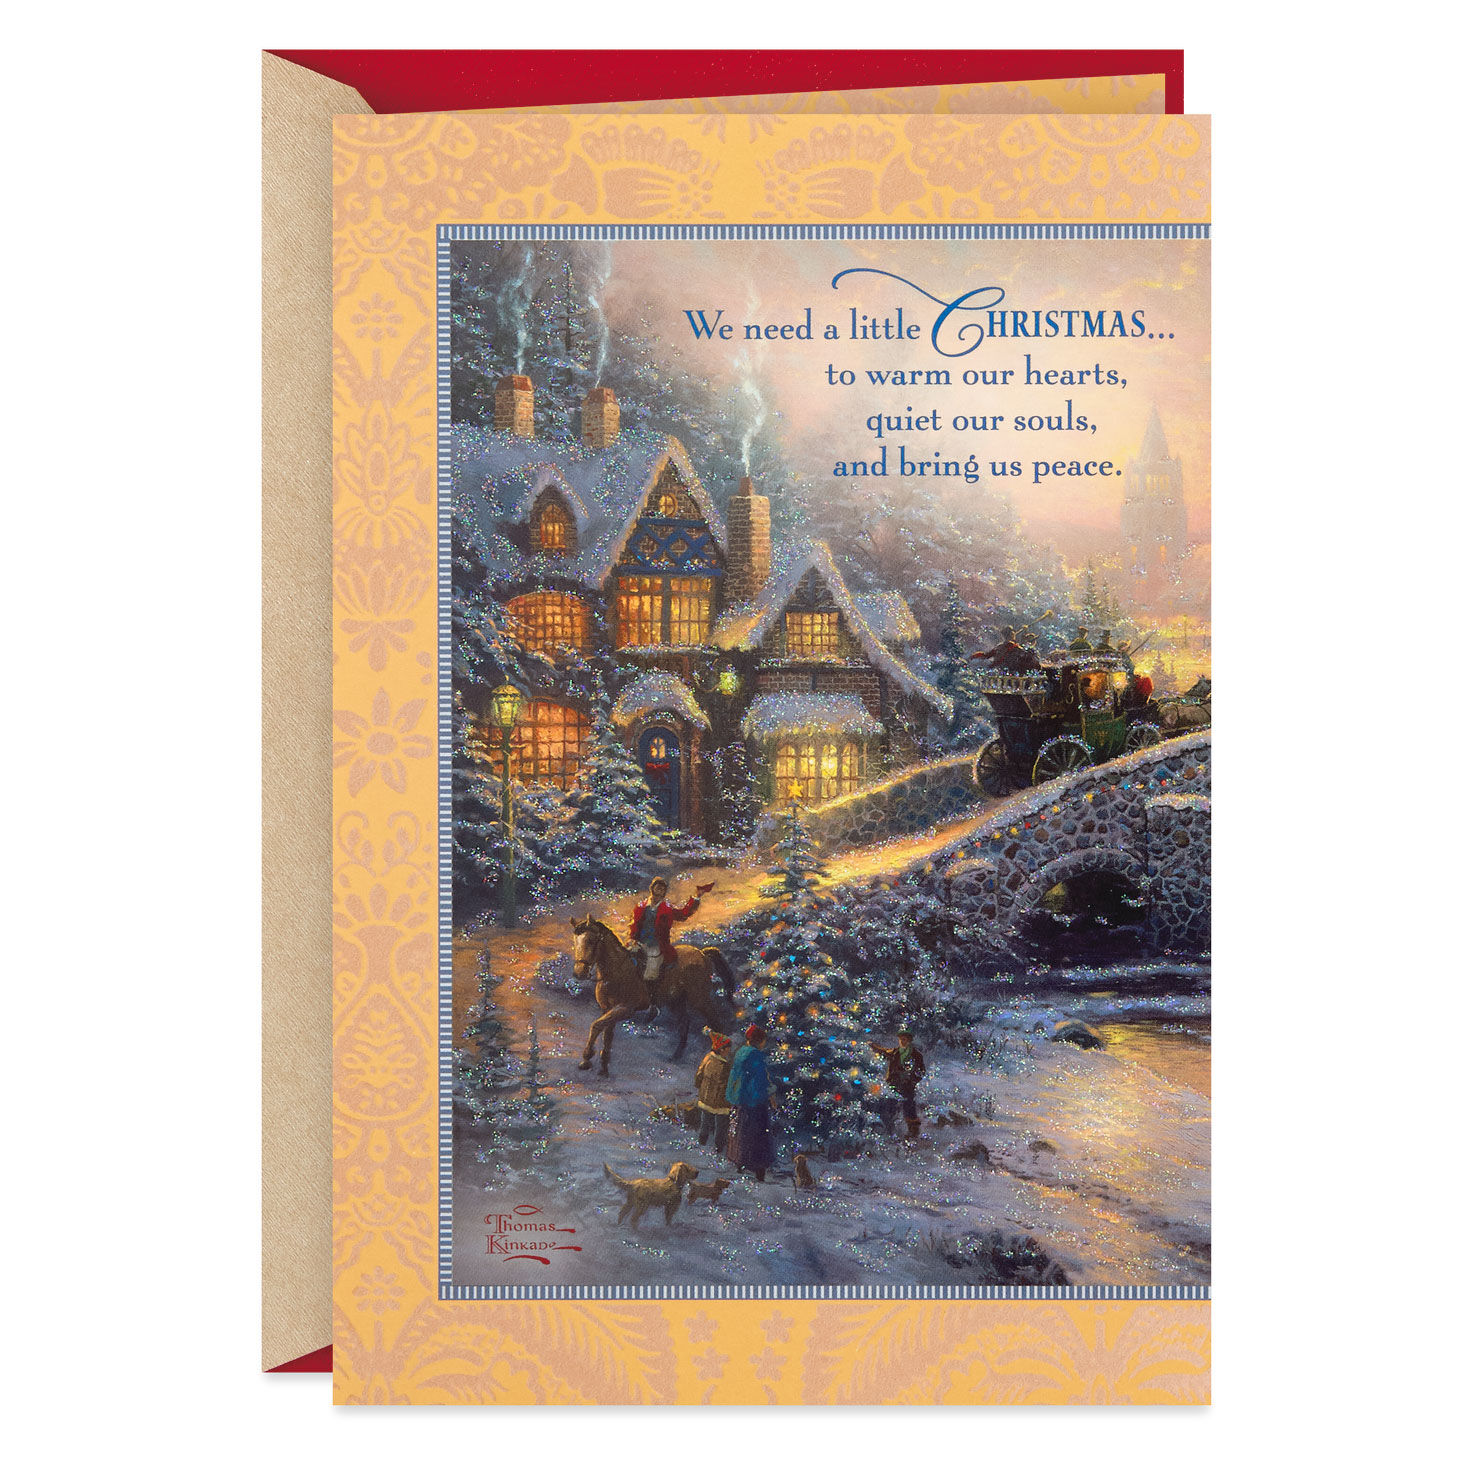 Village Christmas Thomas Kinkade Christmas Card with Message With Envelope